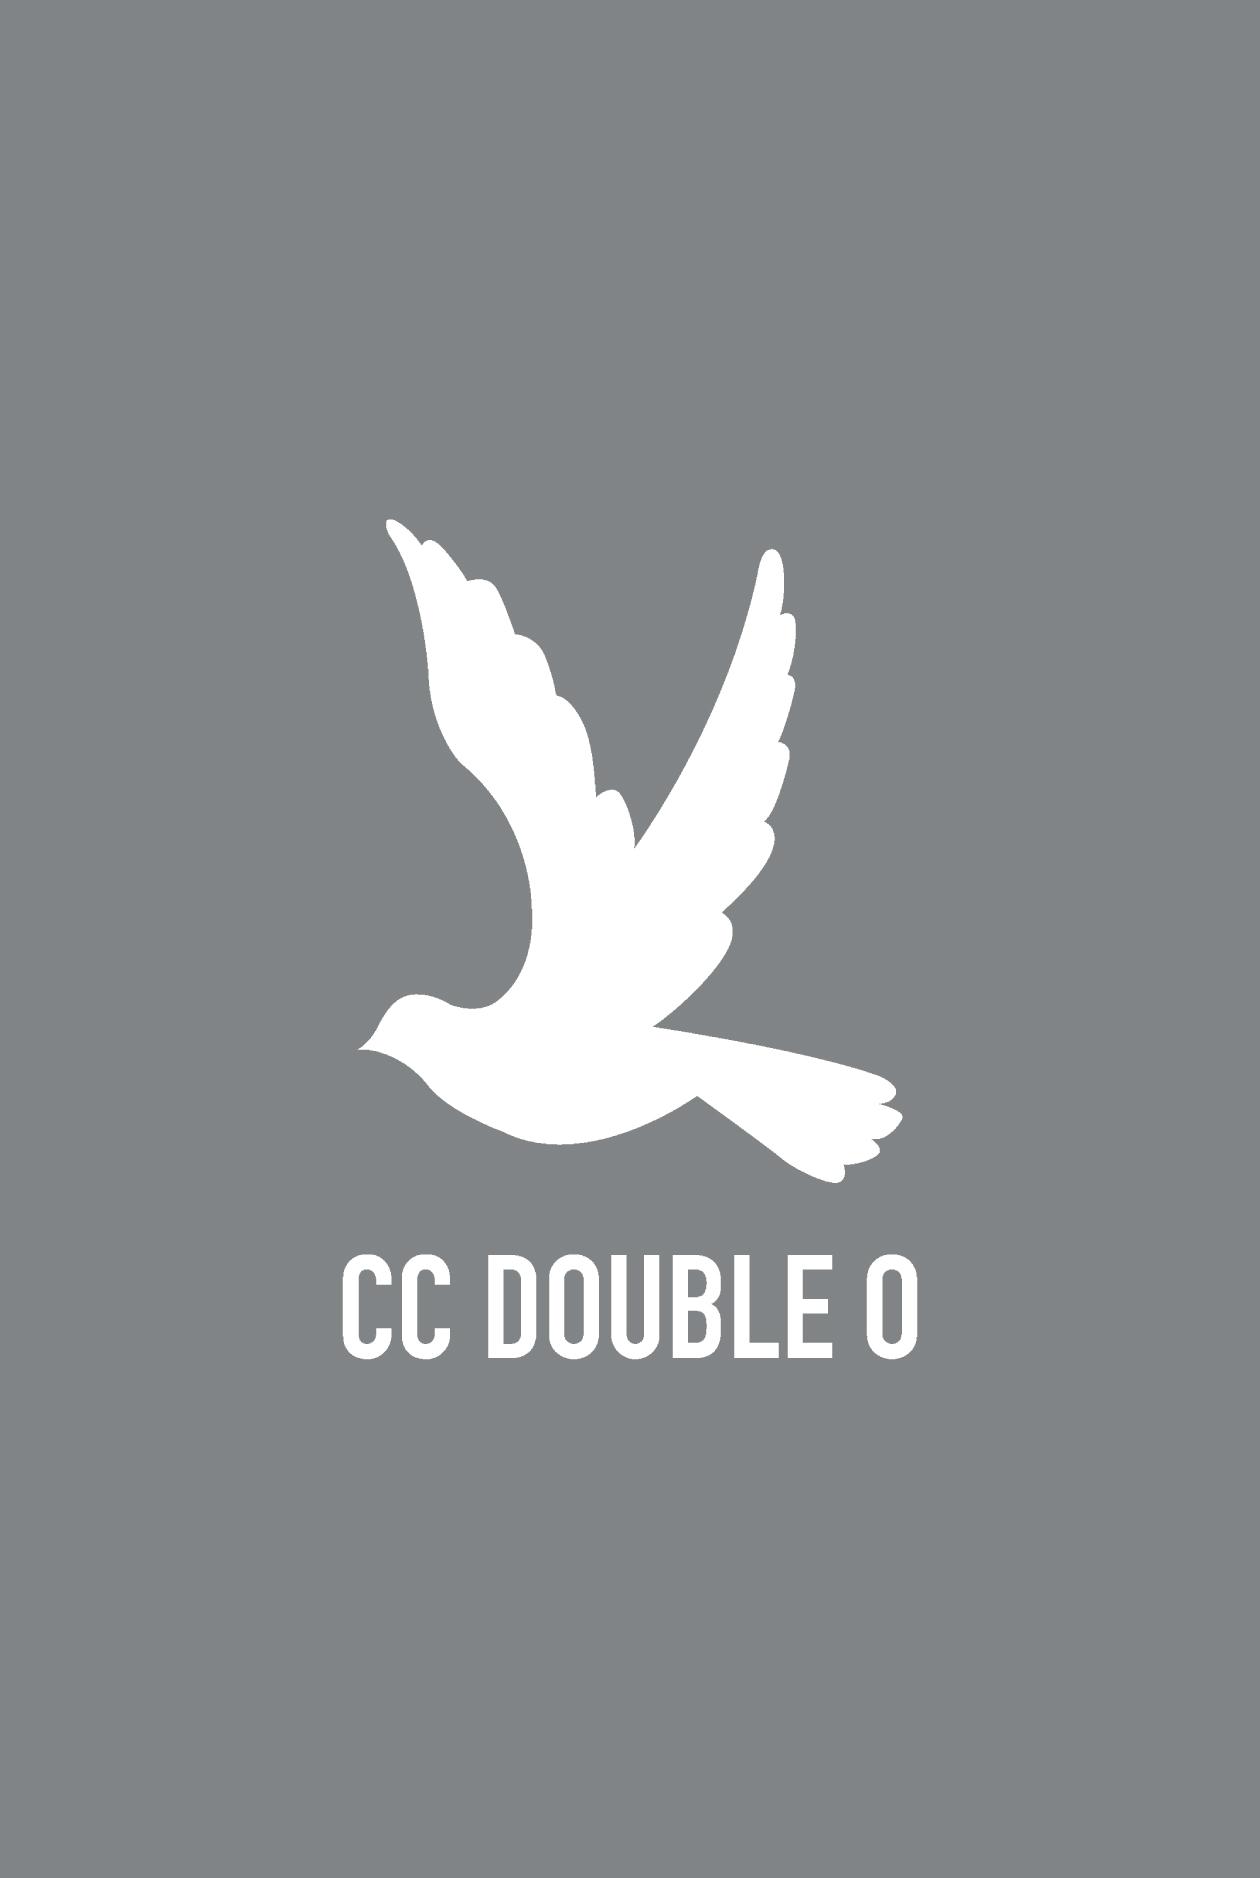 CC DOUBLE O Dip-Dye Tee